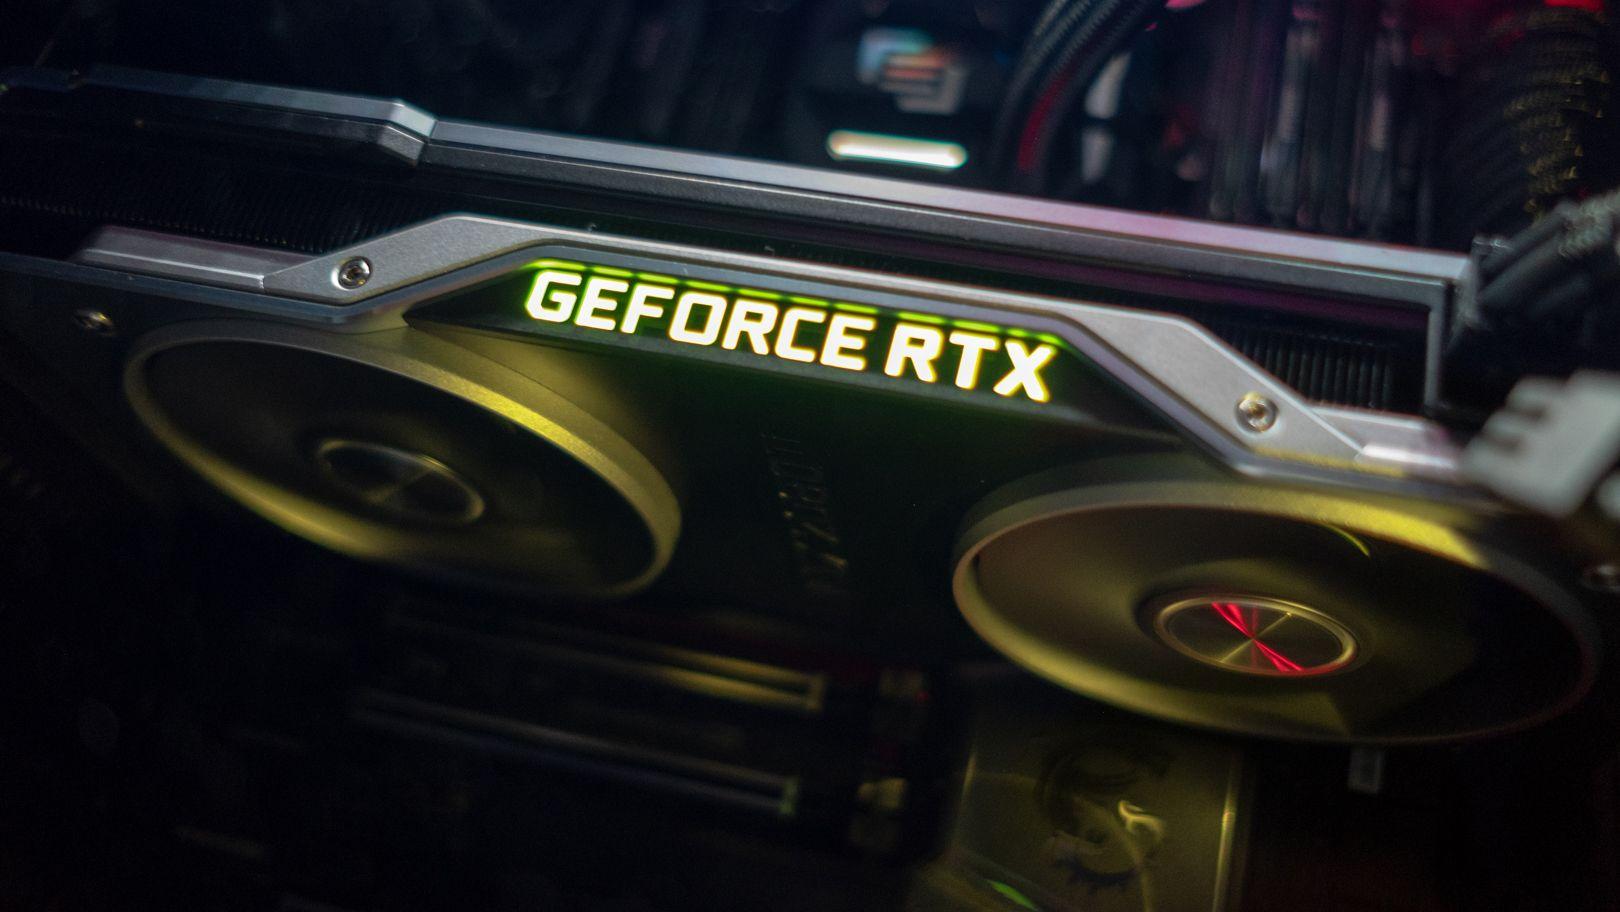 Nvidia GeForce RTX 2080 vs AMD Radeon RX Vega 64 which